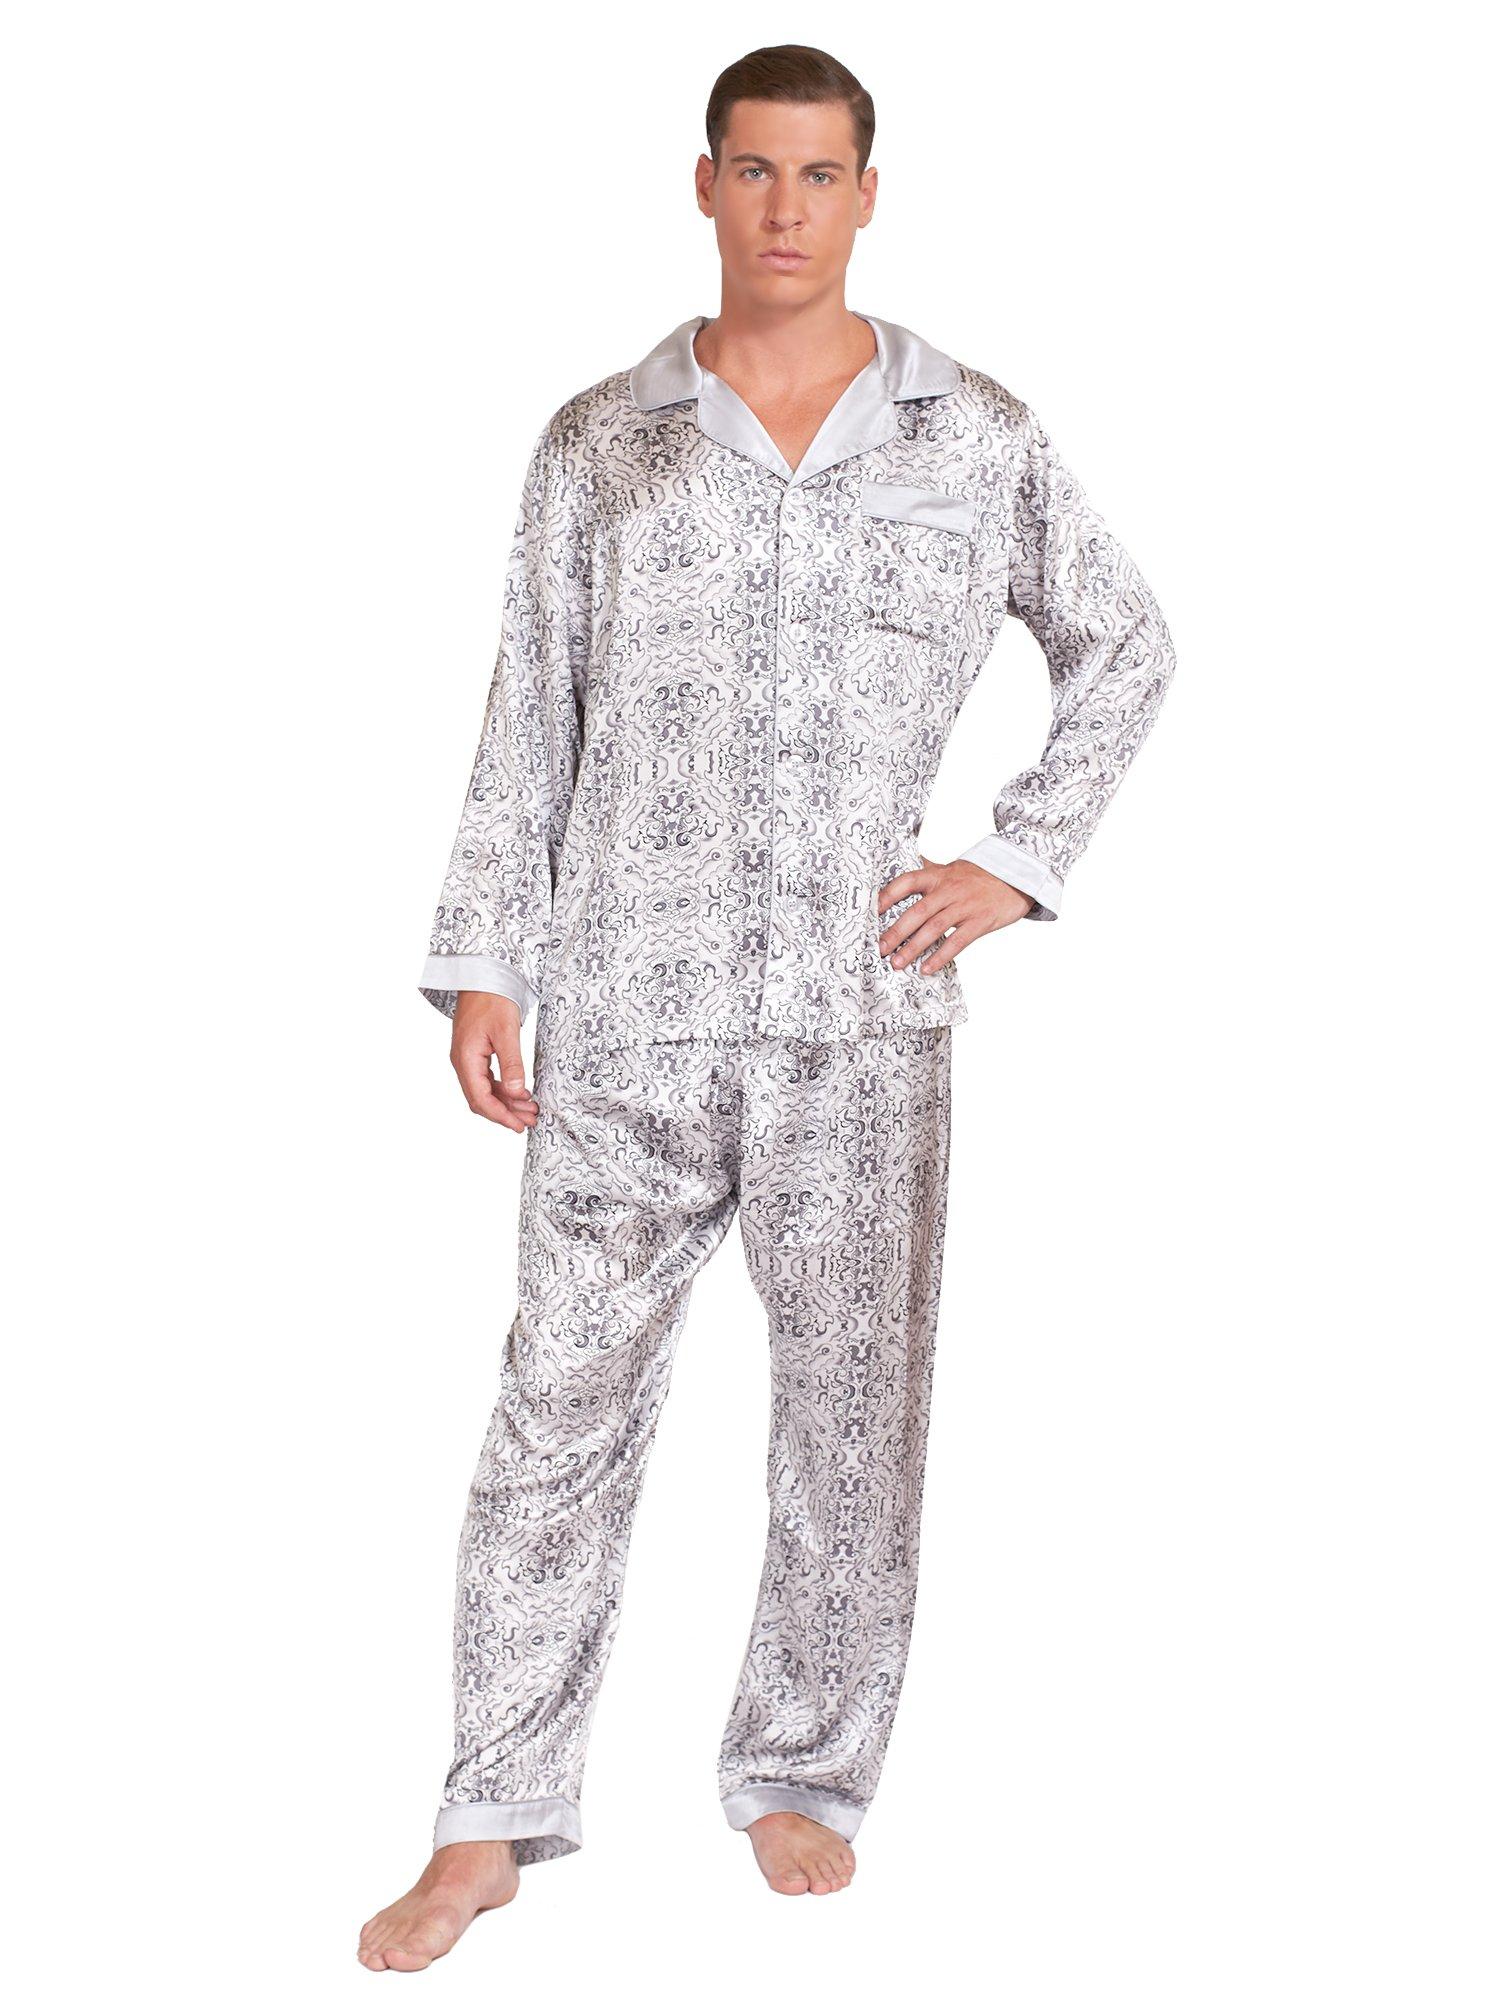 MYK Men's 100% Mulberry Silk Long Pajamas Set (Pajama Shirt & Pants), Classic Silver Prints (Medium)